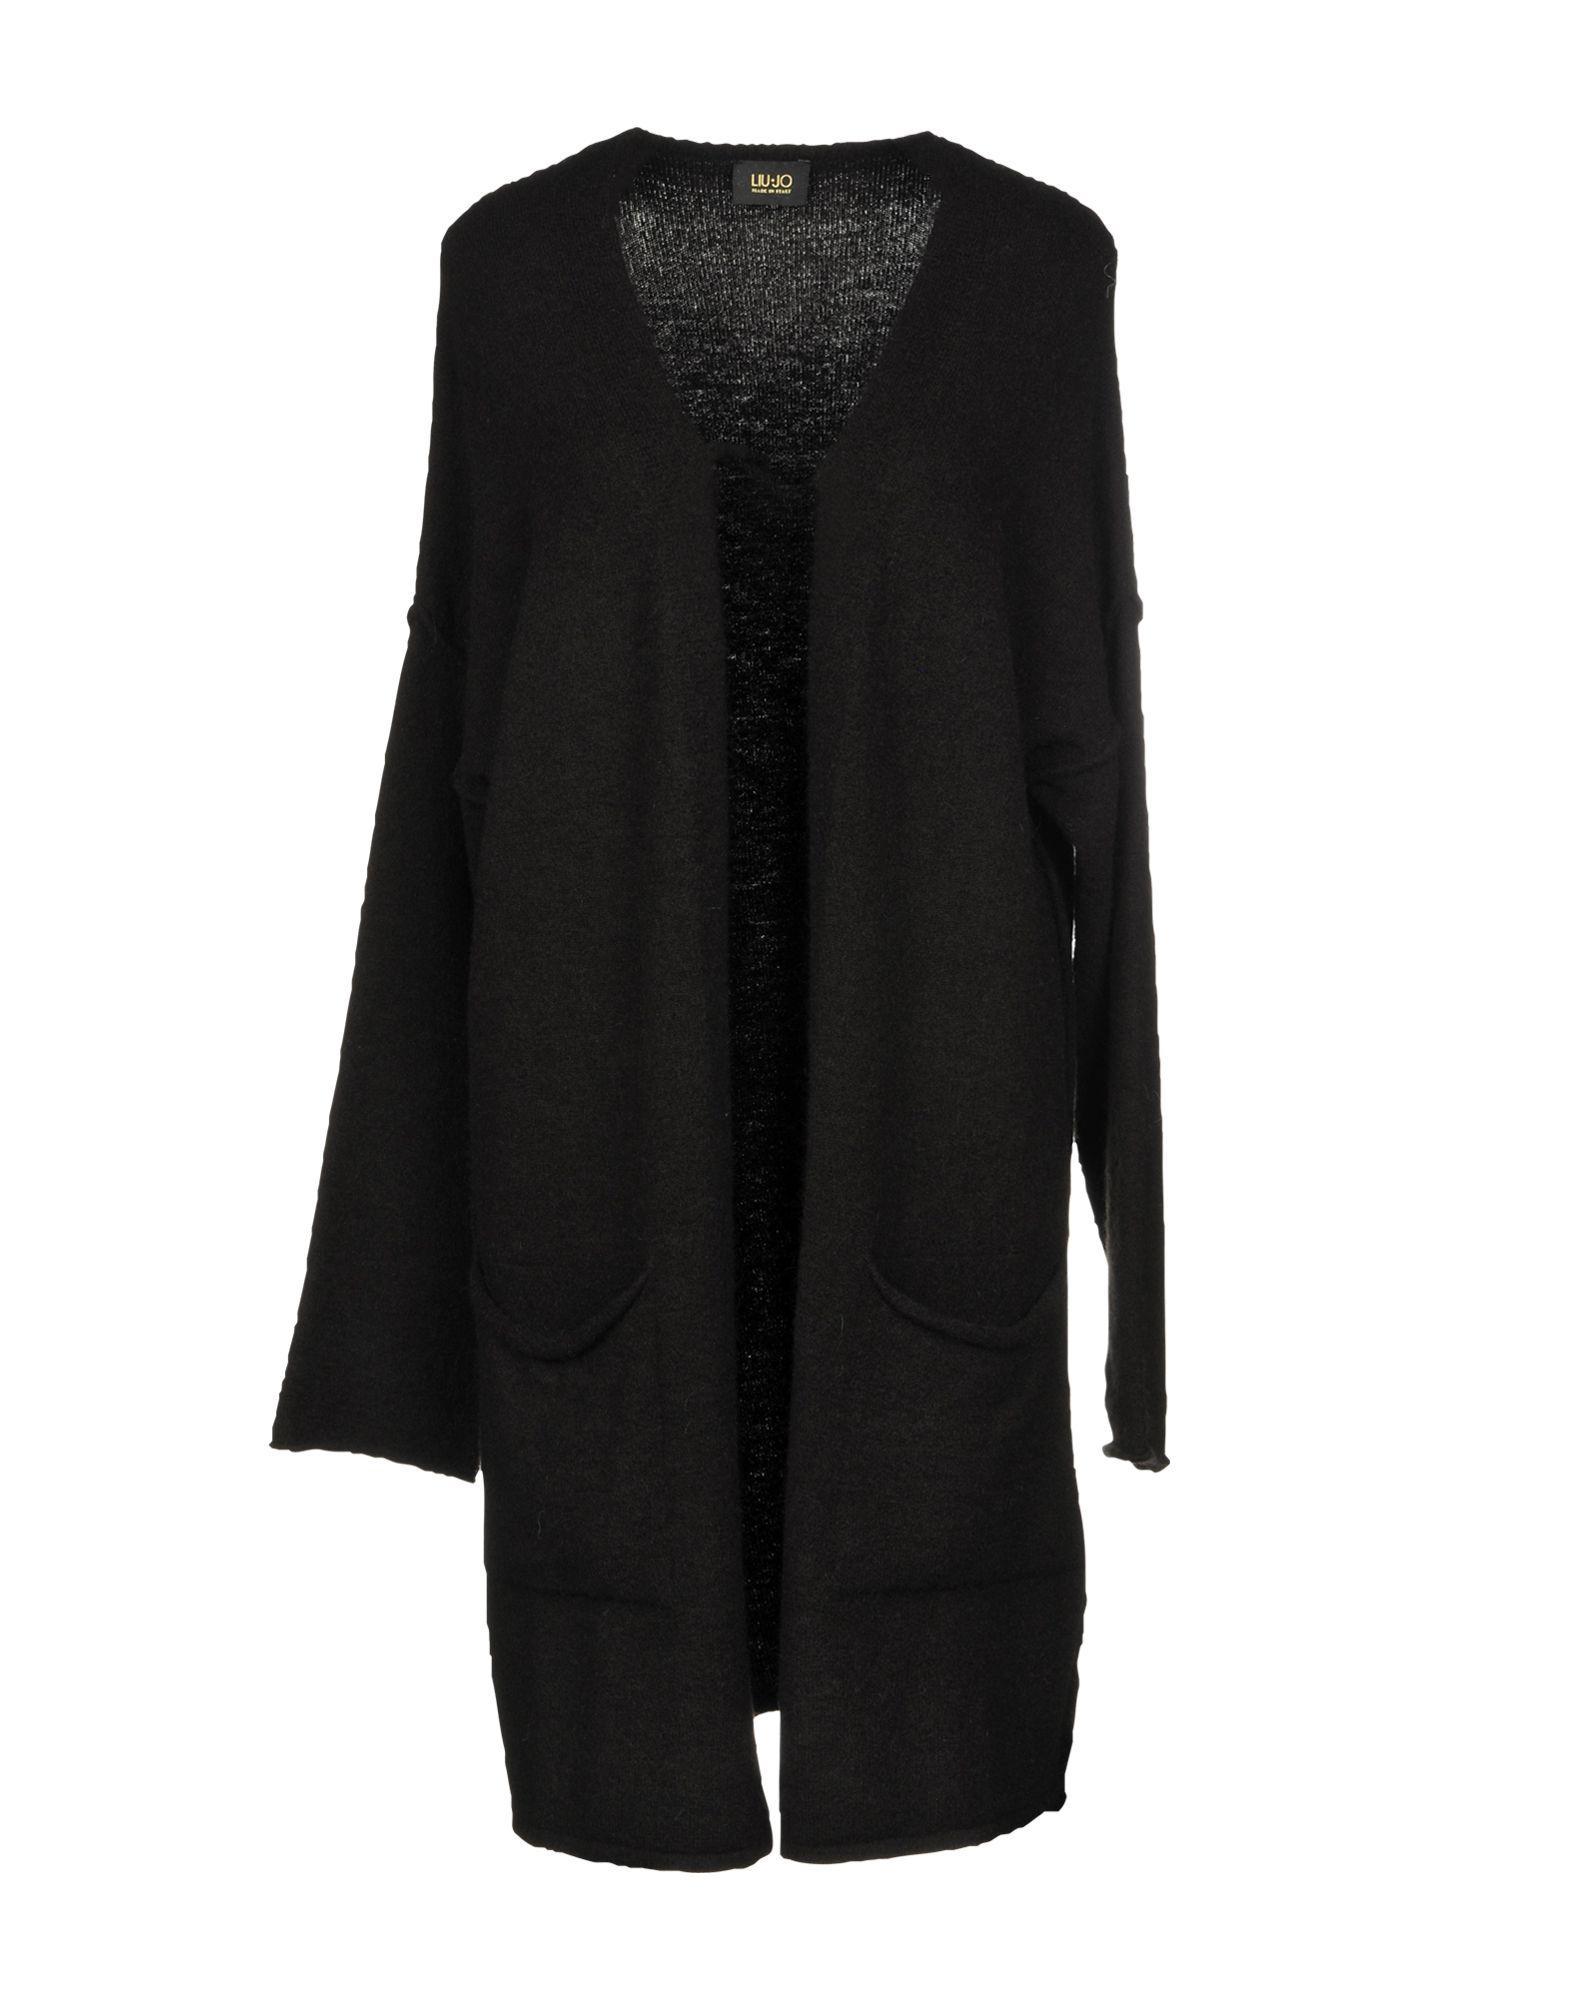 Liu •jo Cardigan In Black